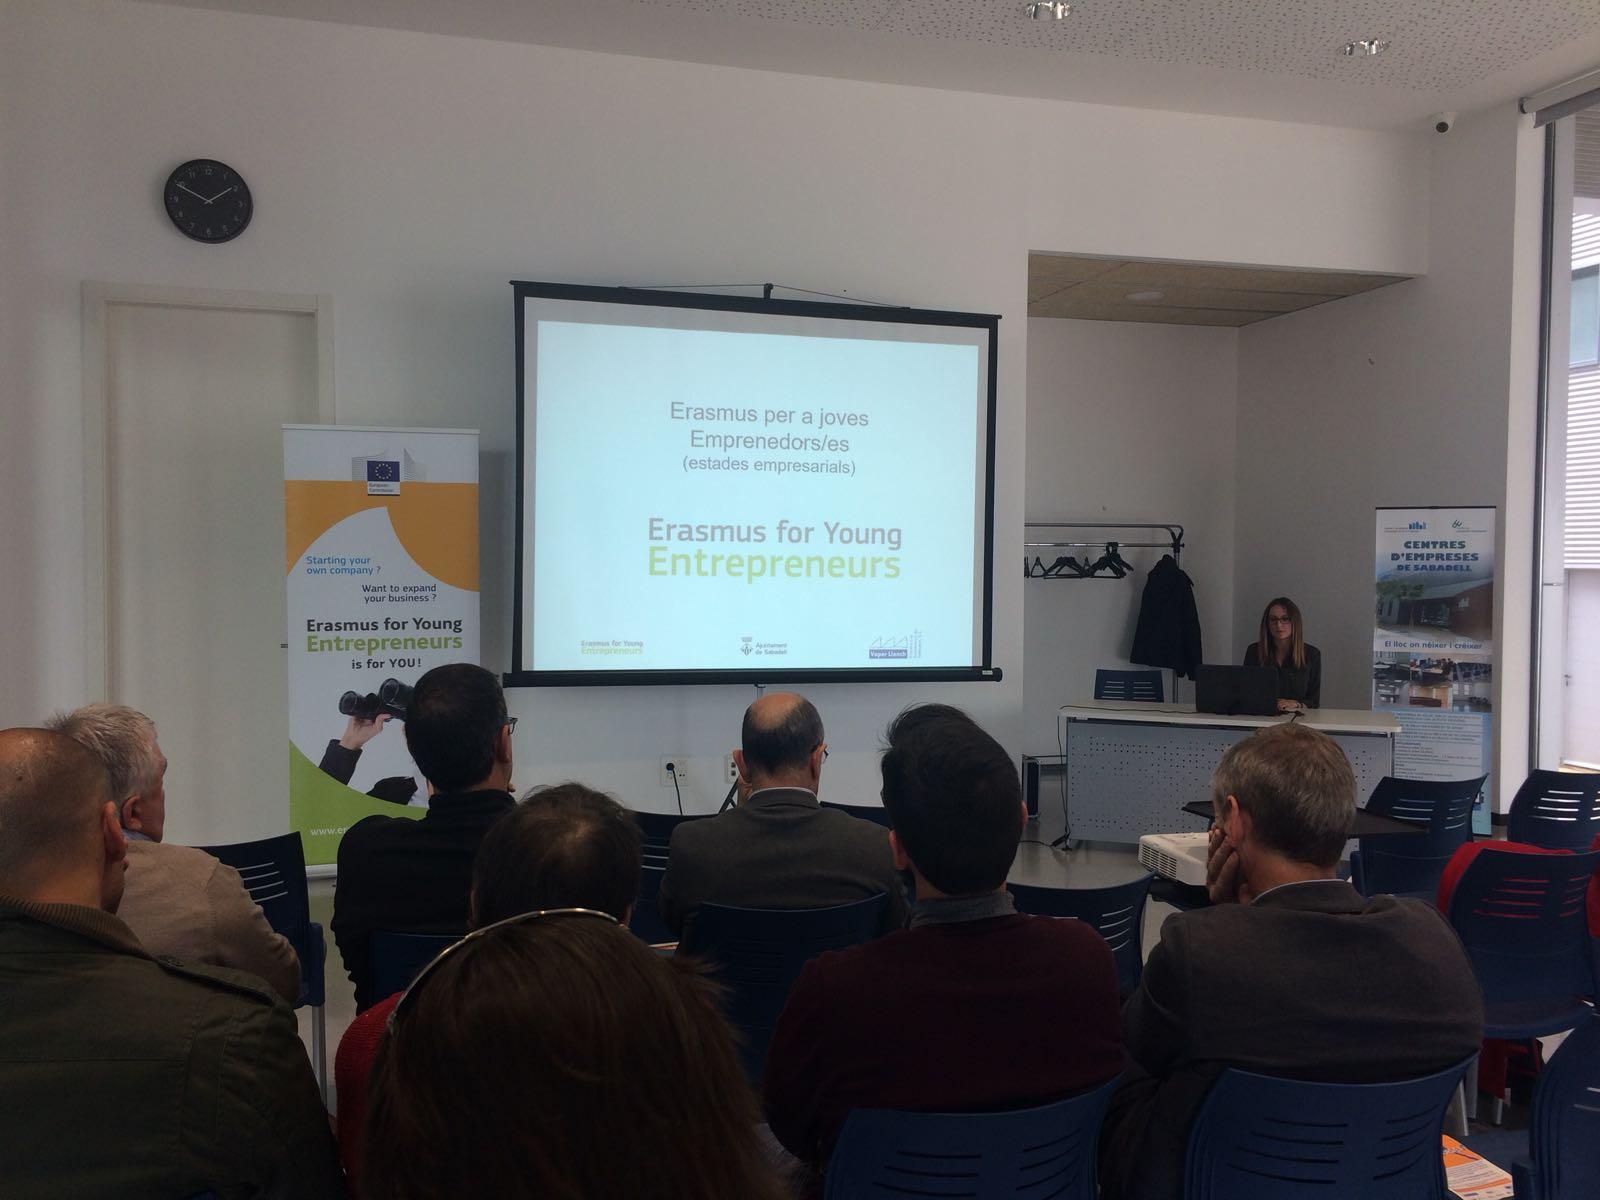 El programa Erasmus per Joves Emprenedors/es